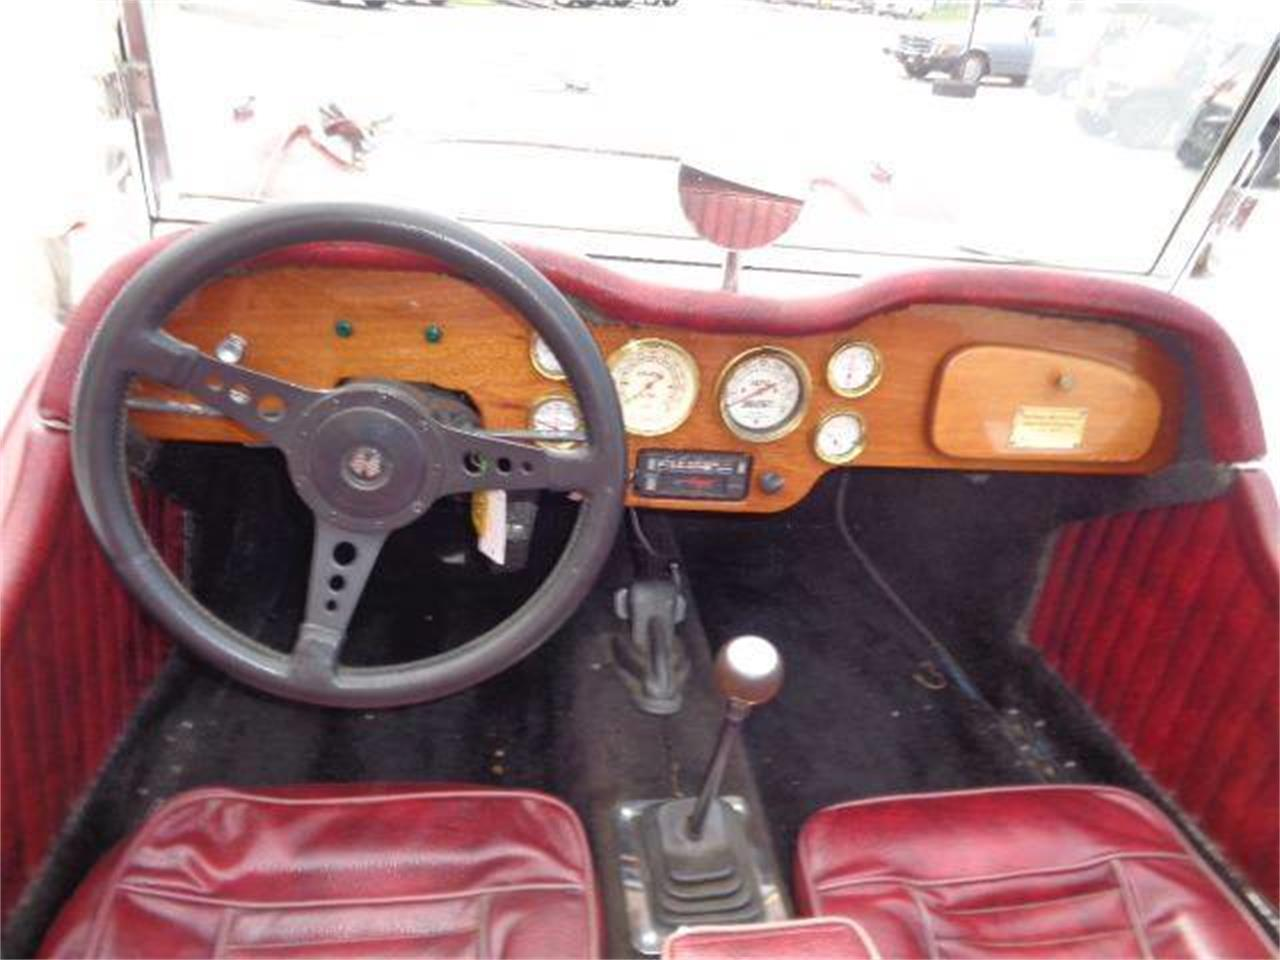 1979 Mercedes-Benz Gazelle (CC-1103010) for sale in Staunton, Illinois